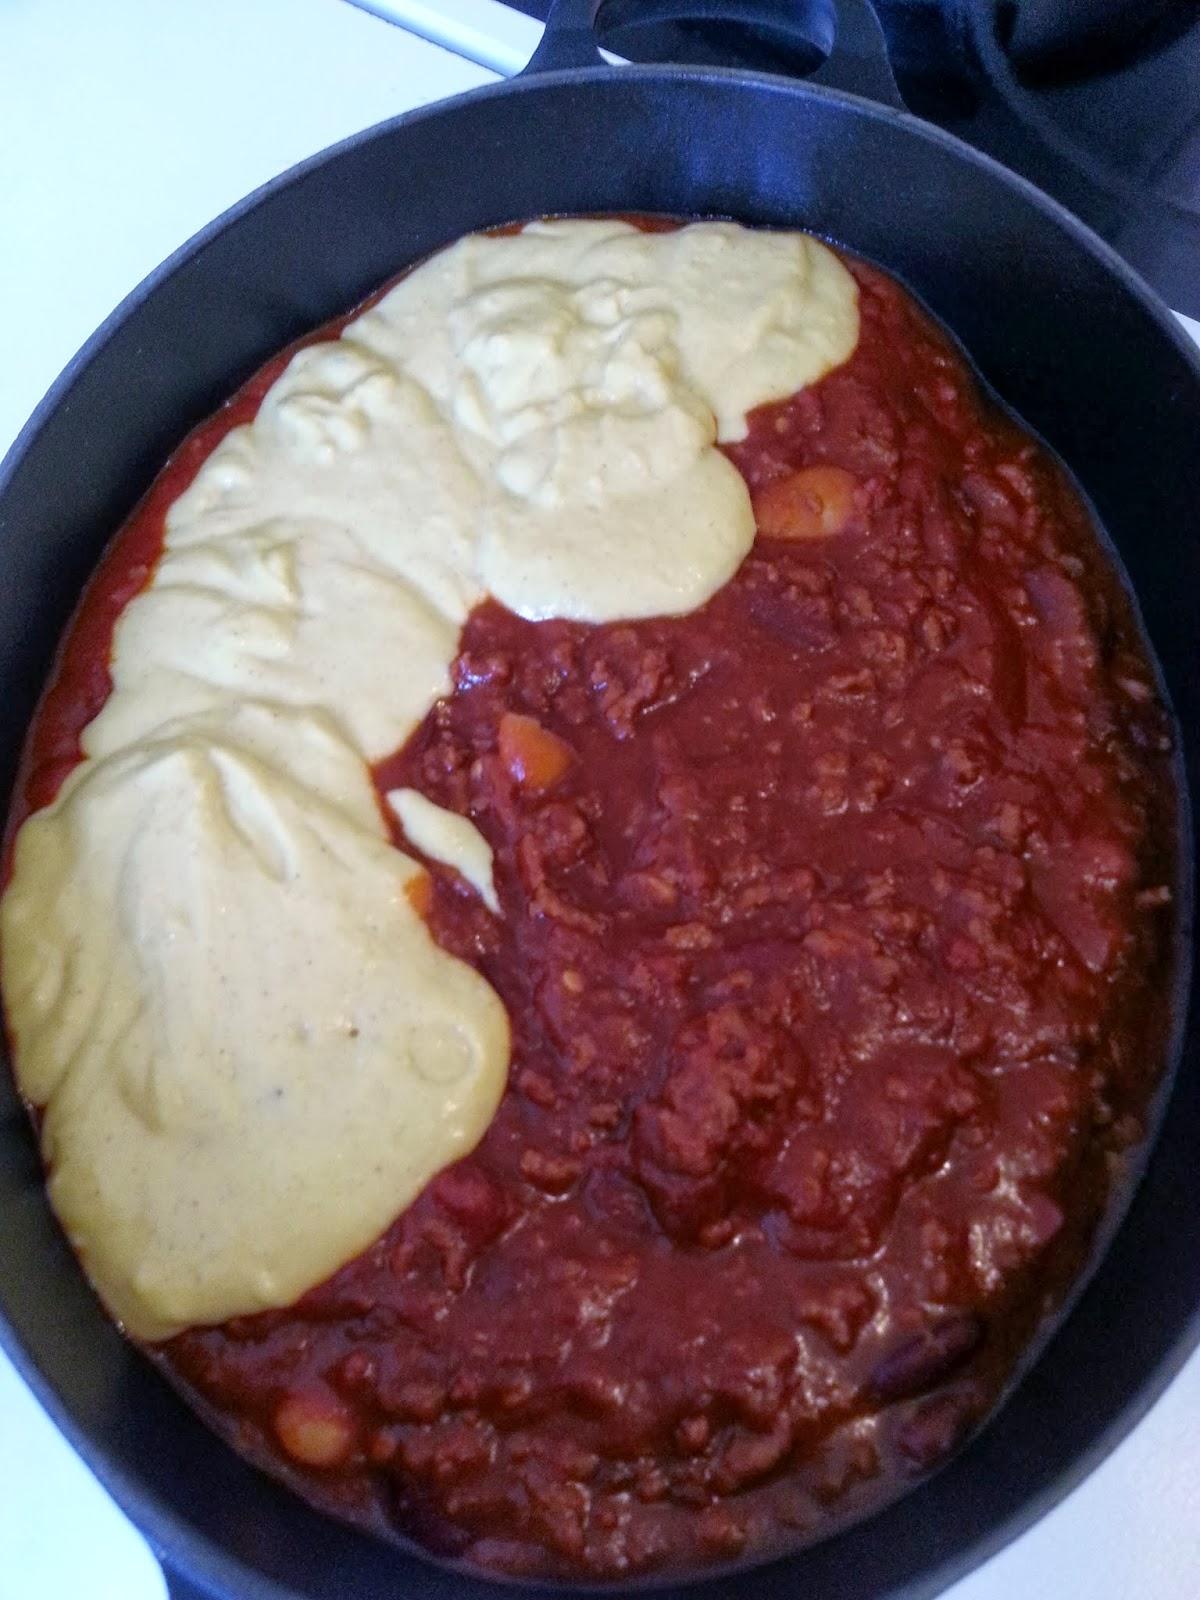 Gravrøverens chili con carne